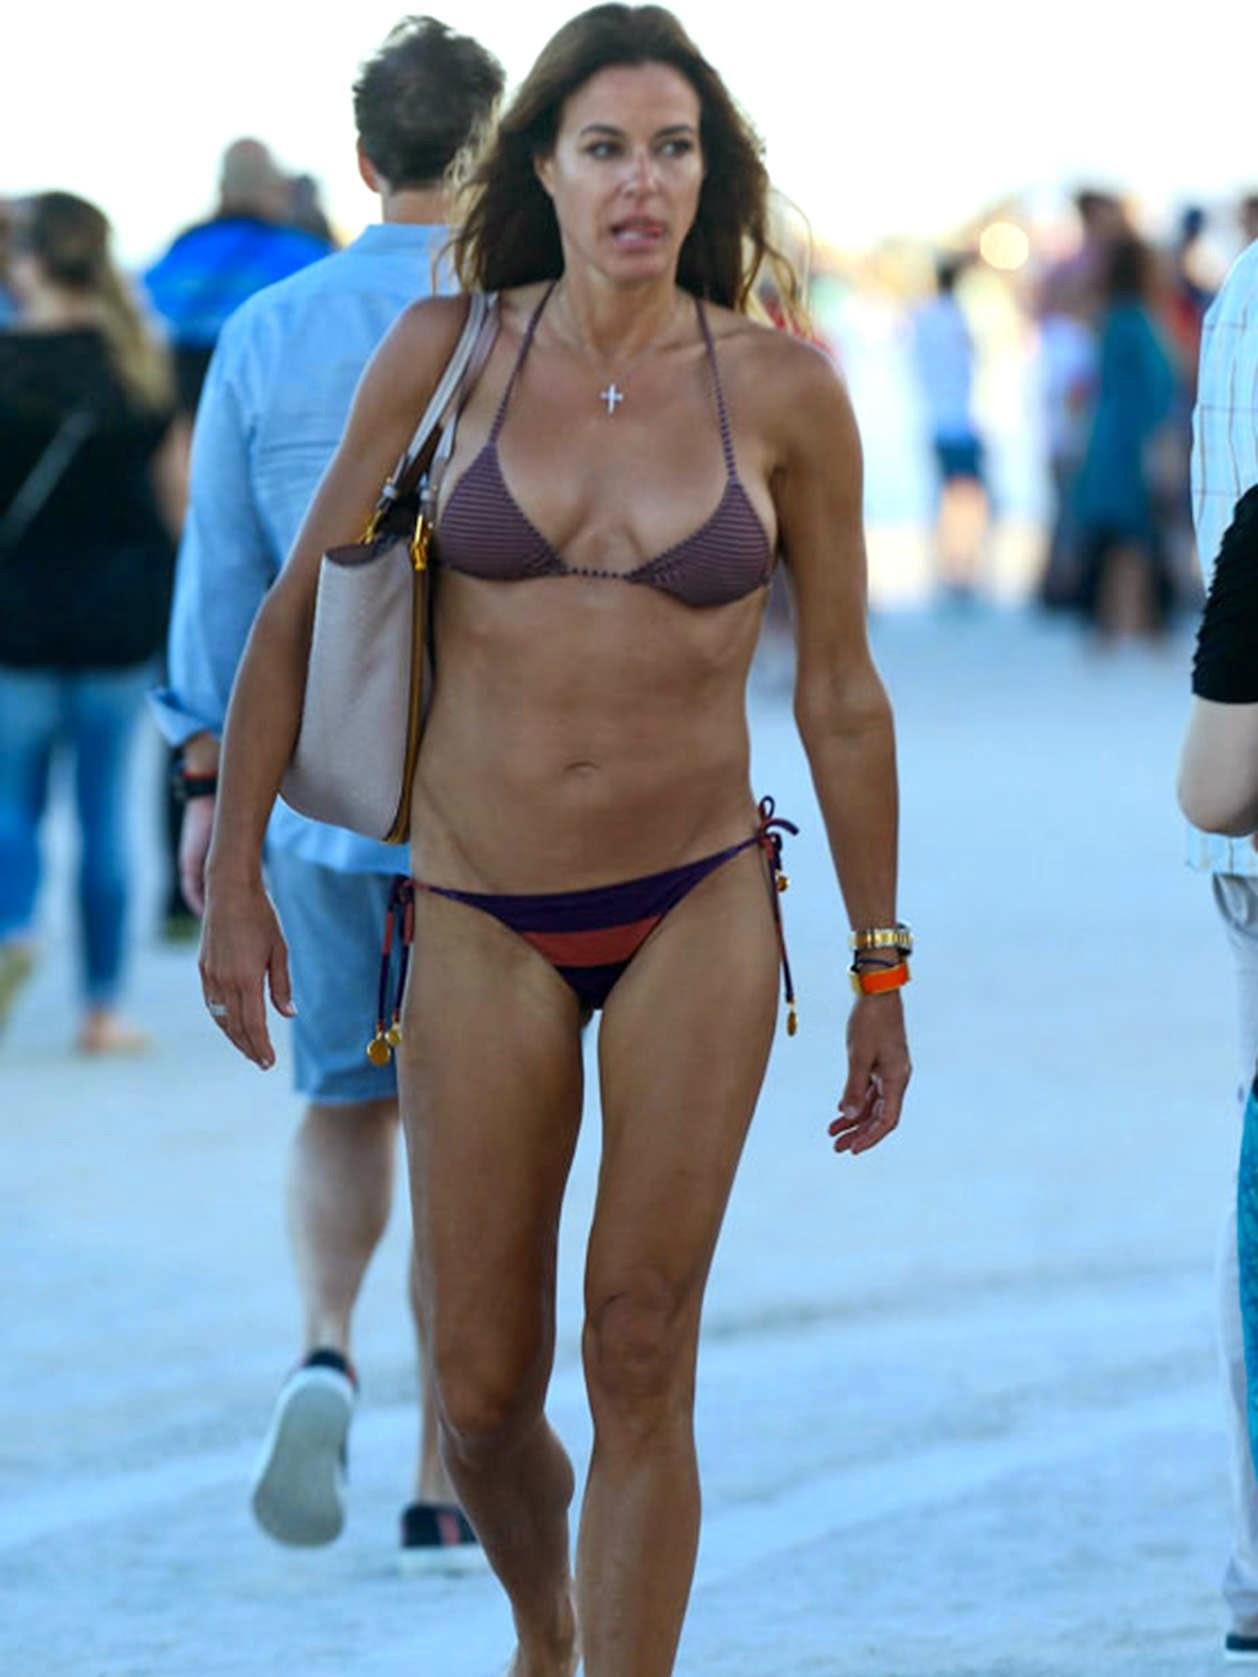 Kelly Bensimon Bikini In Miami Icelev Com Sceleb Com